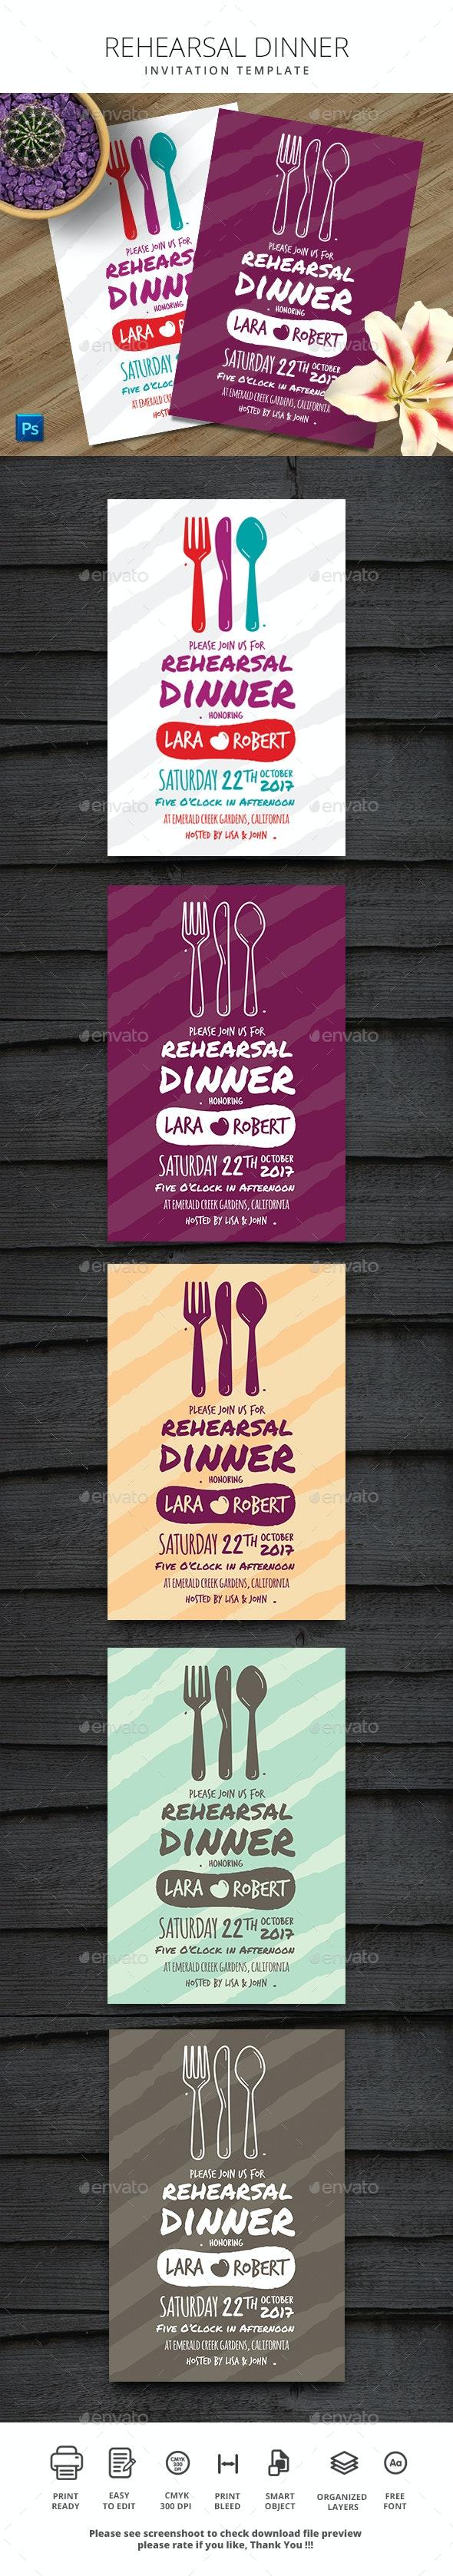 Rehearsal Dinner Invitation - Events Flyers